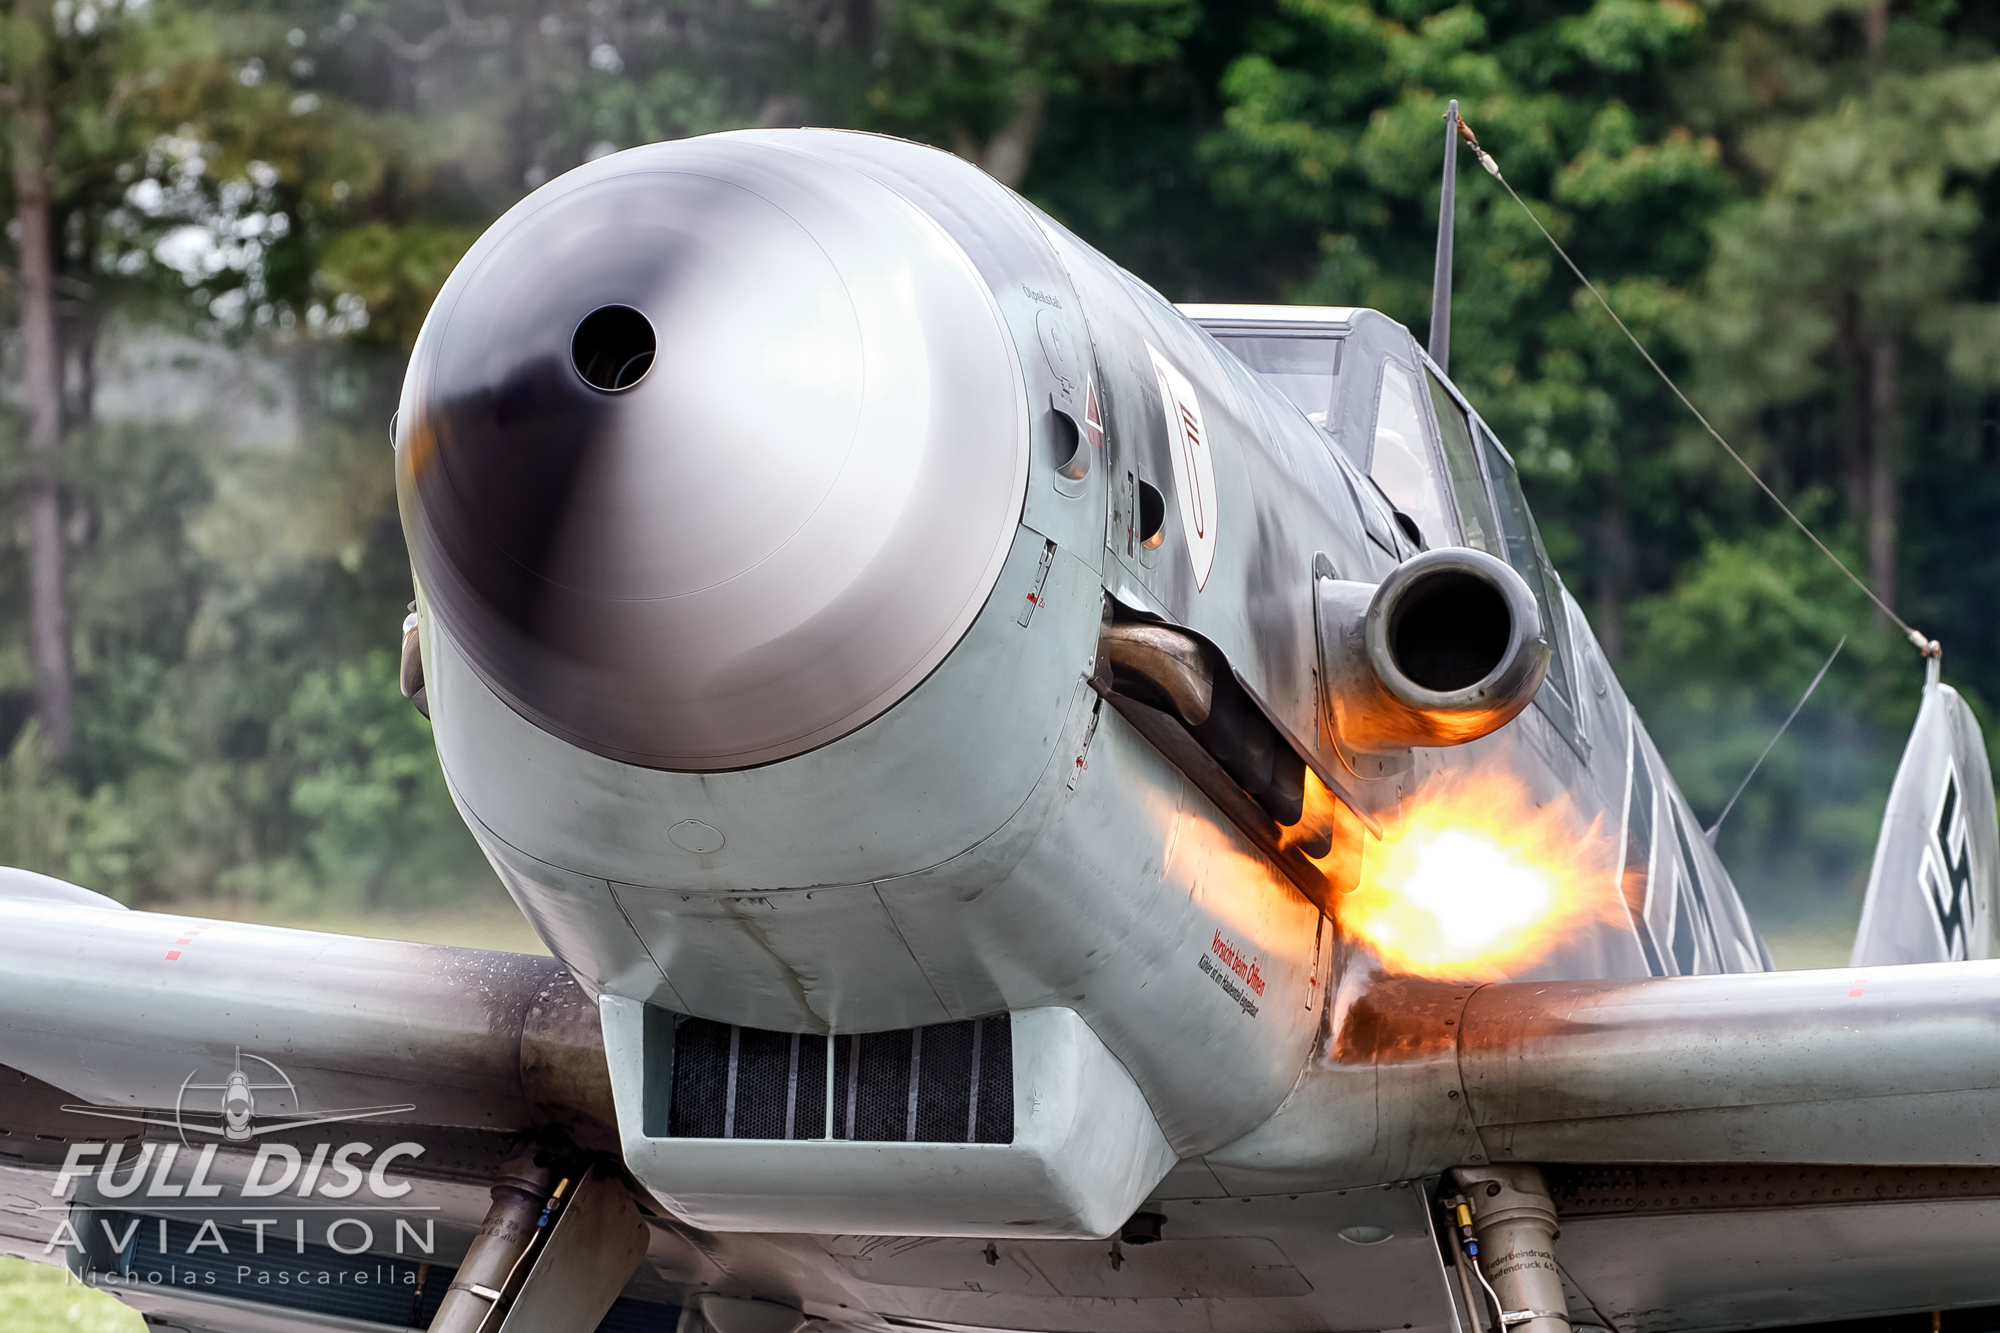 nickpascarella_nicholaspascarella_fulldiscaviation_aircraft_bf109_fire.jpg